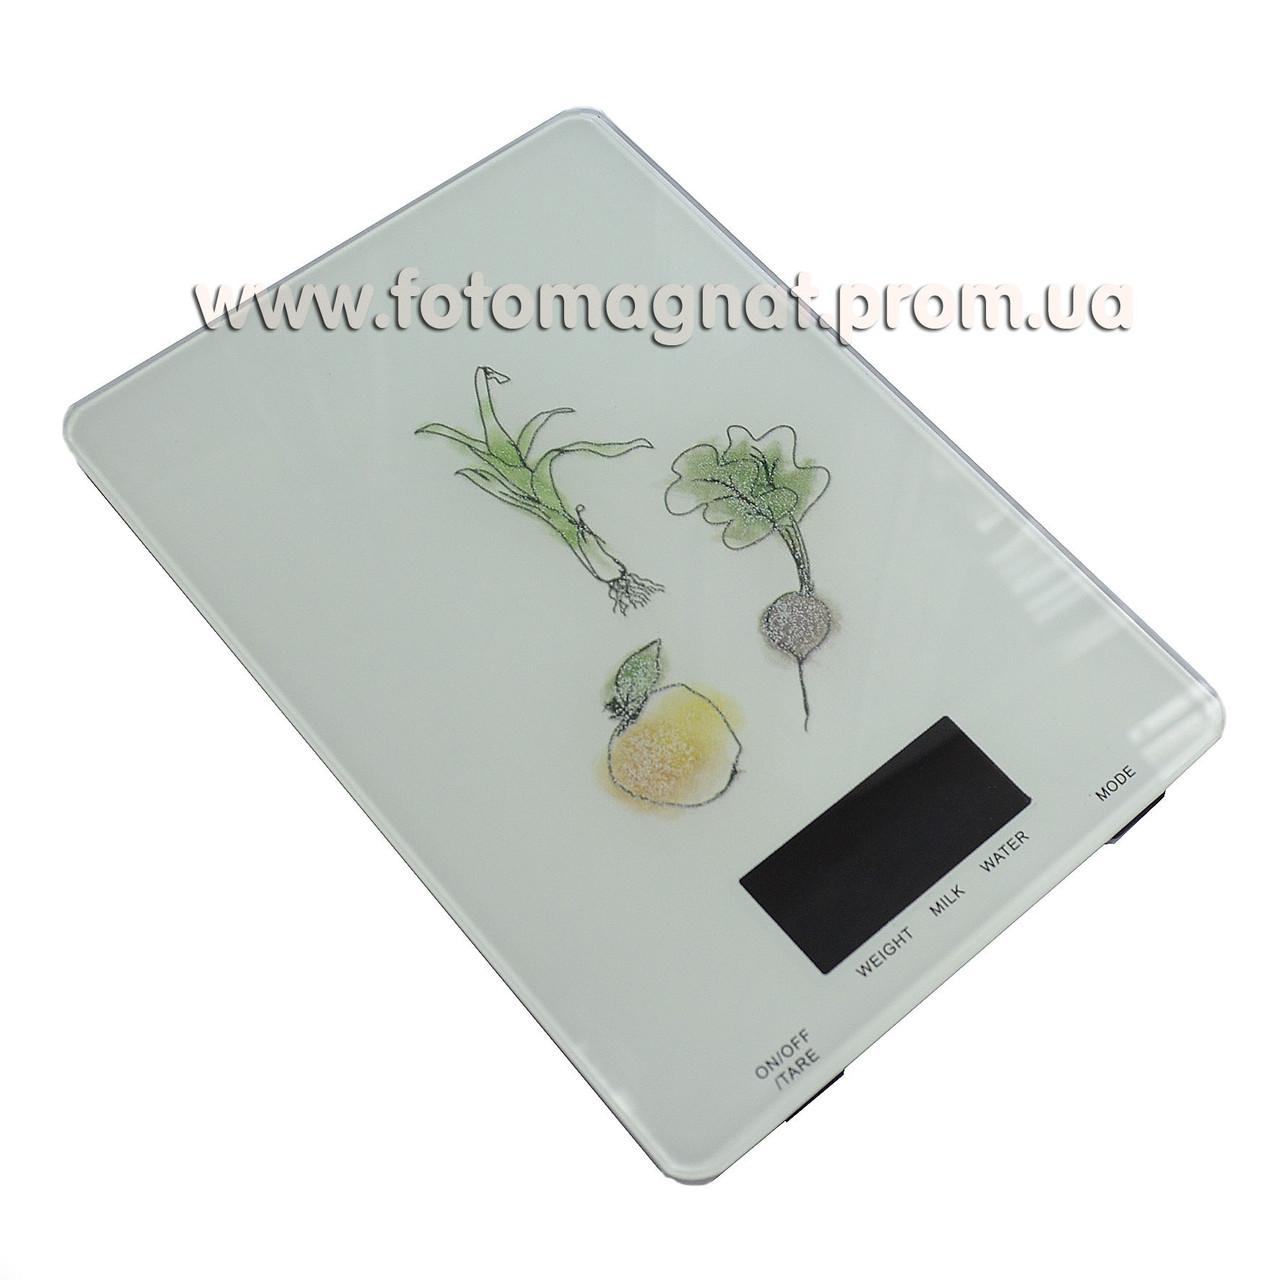 Весы кухонные электронные  CFC2025/34-1207-5/6144/SF610A 5кг(электронные весы)